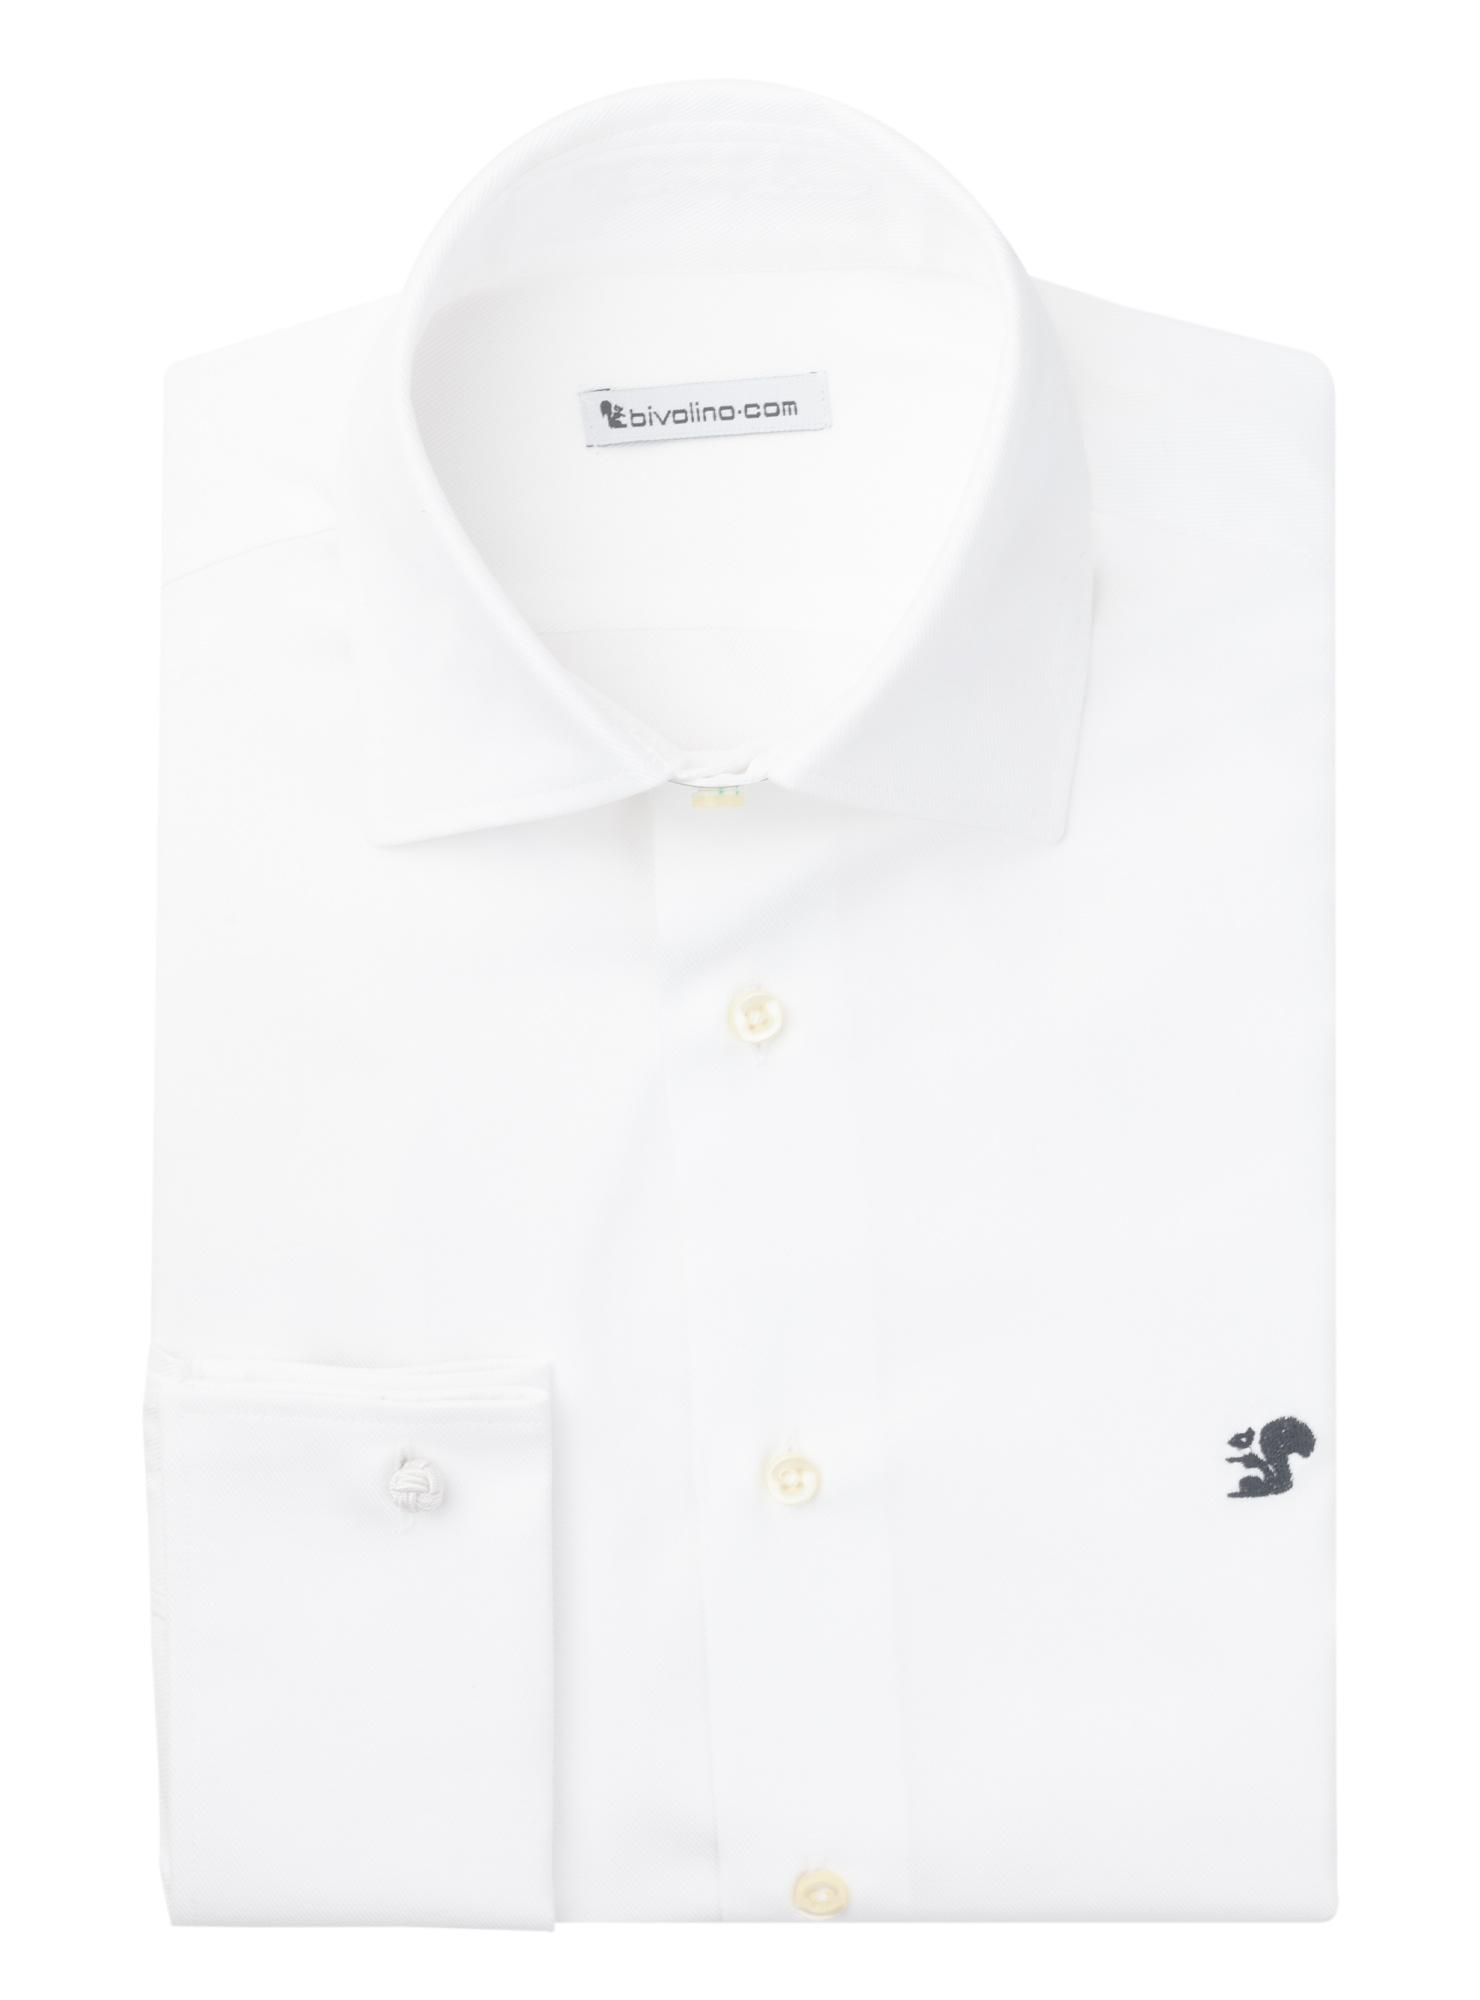 FERRARA - chemise homme DAVID and JOHN ANDERSON d' ALBINI  twill double retors blanc - ZAMBO 1